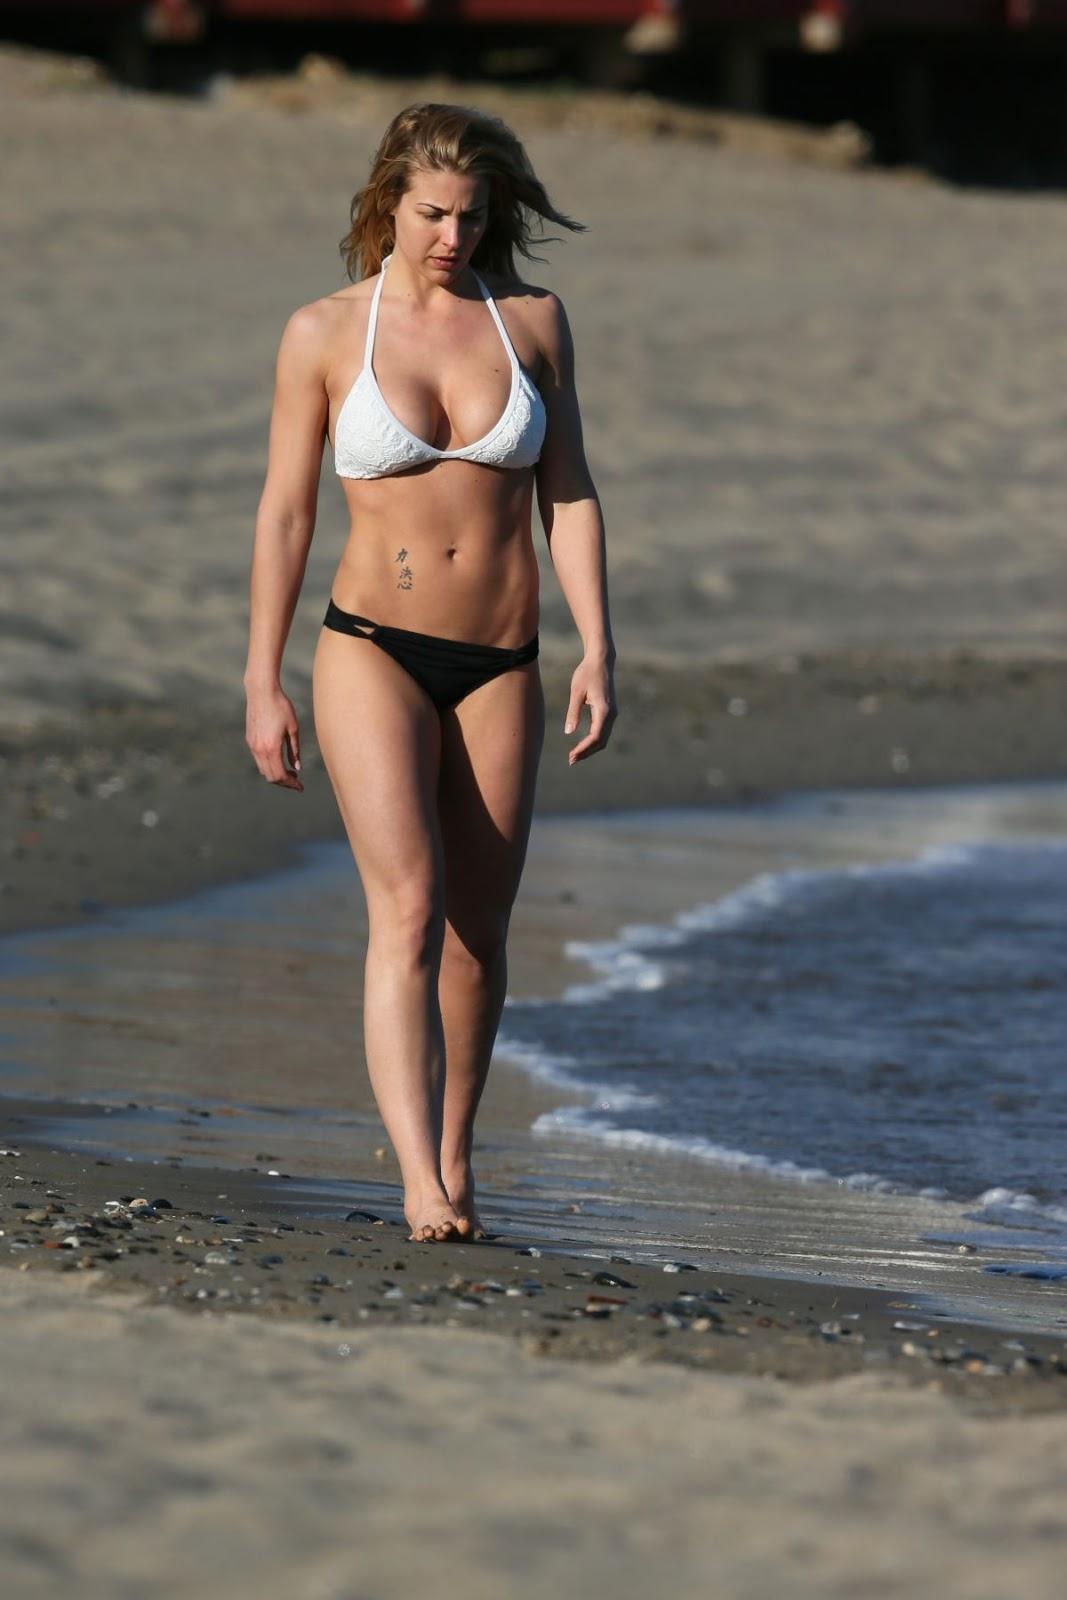 Bikini Gemma MBikiniey nude (74 photo), Tits, Fappening, Feet, swimsuit 2015